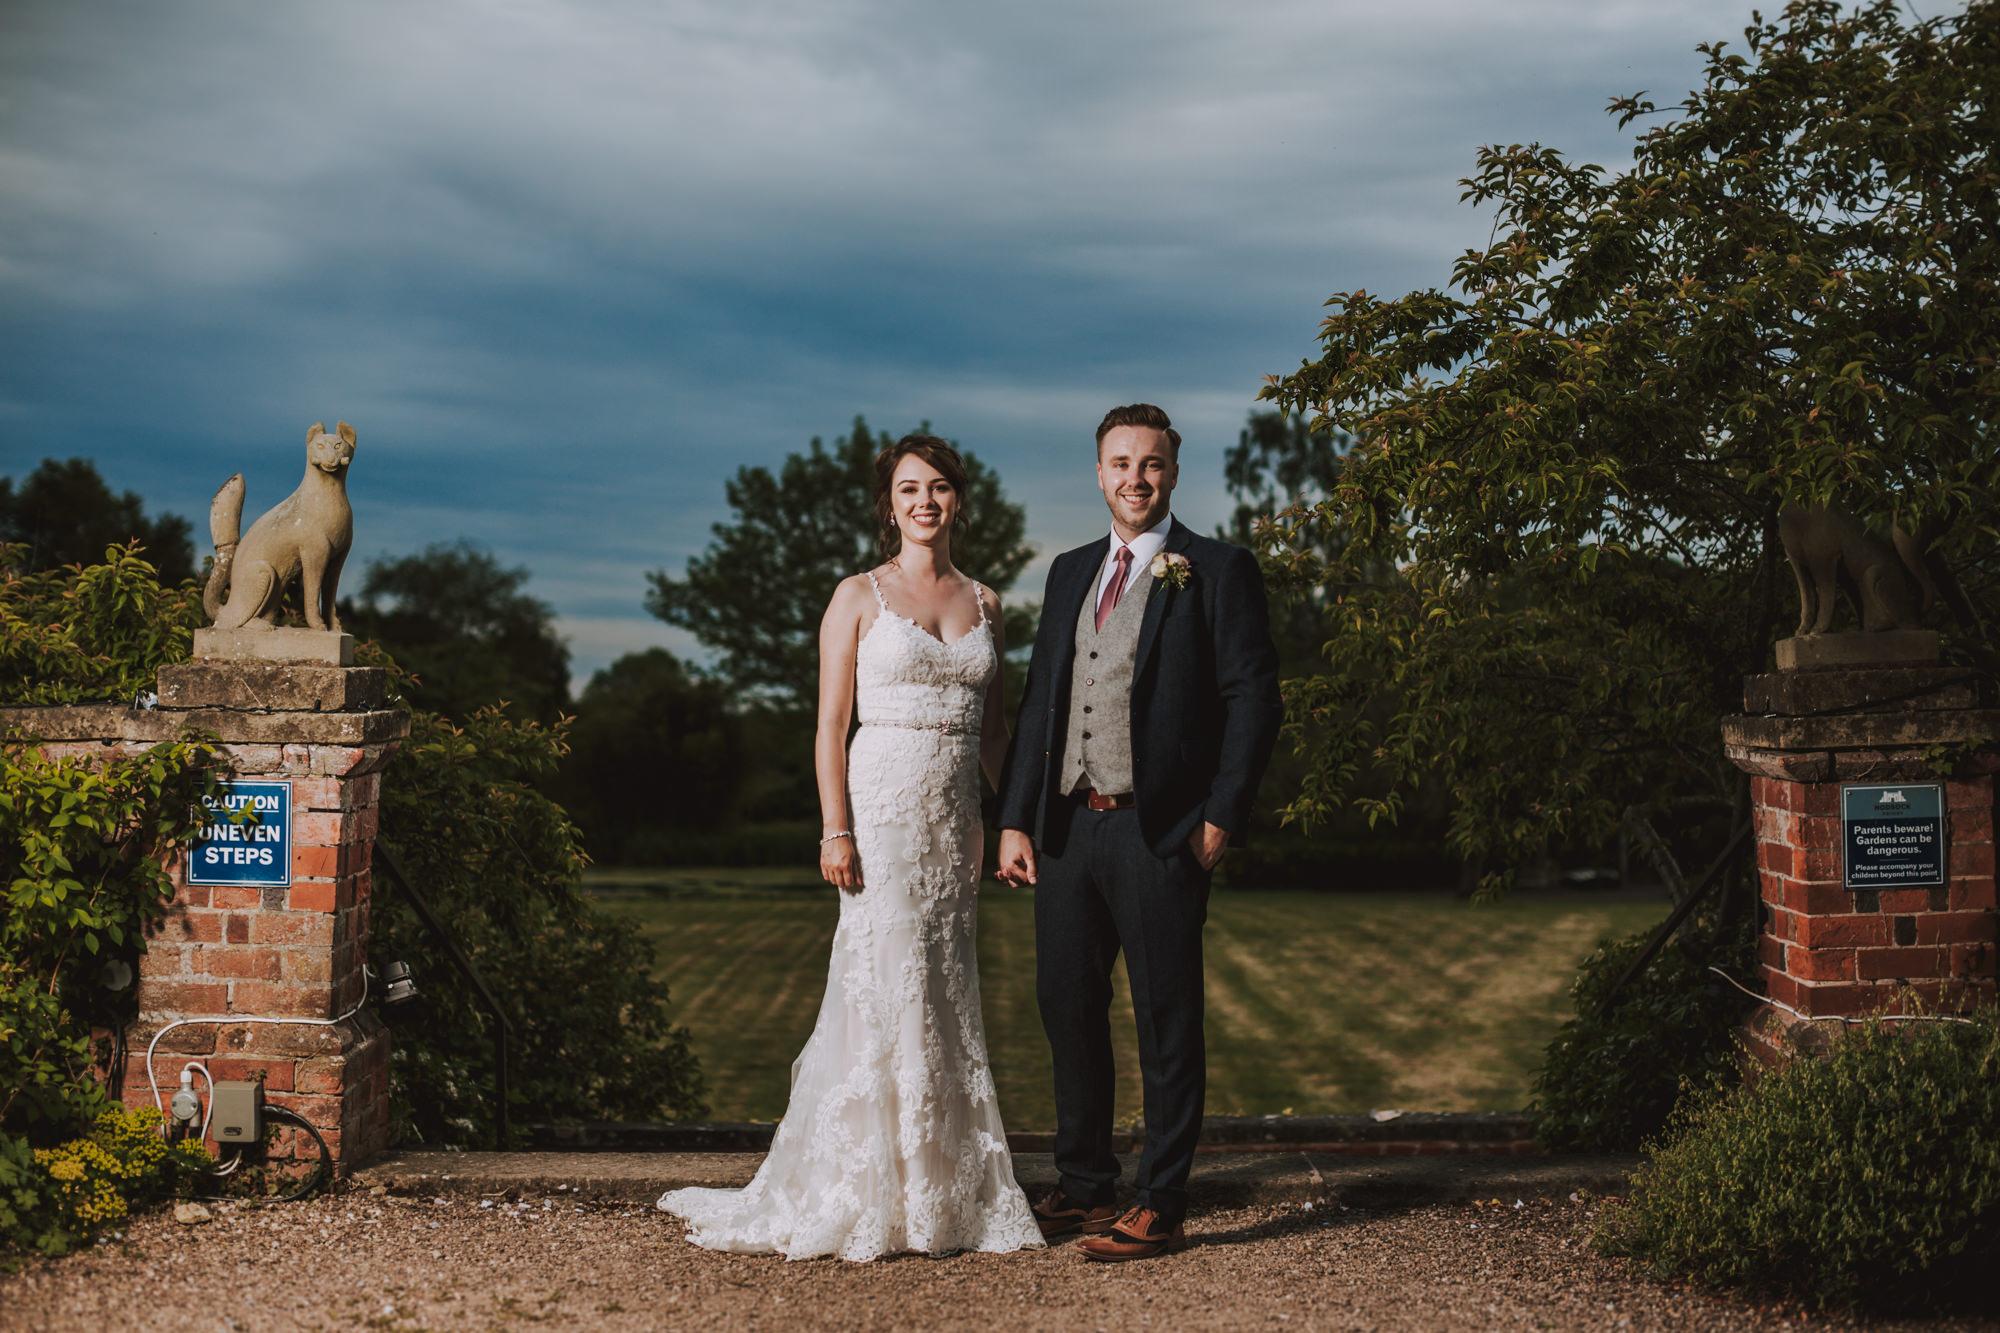 hodsock priory wedding photographers blog93.jpg